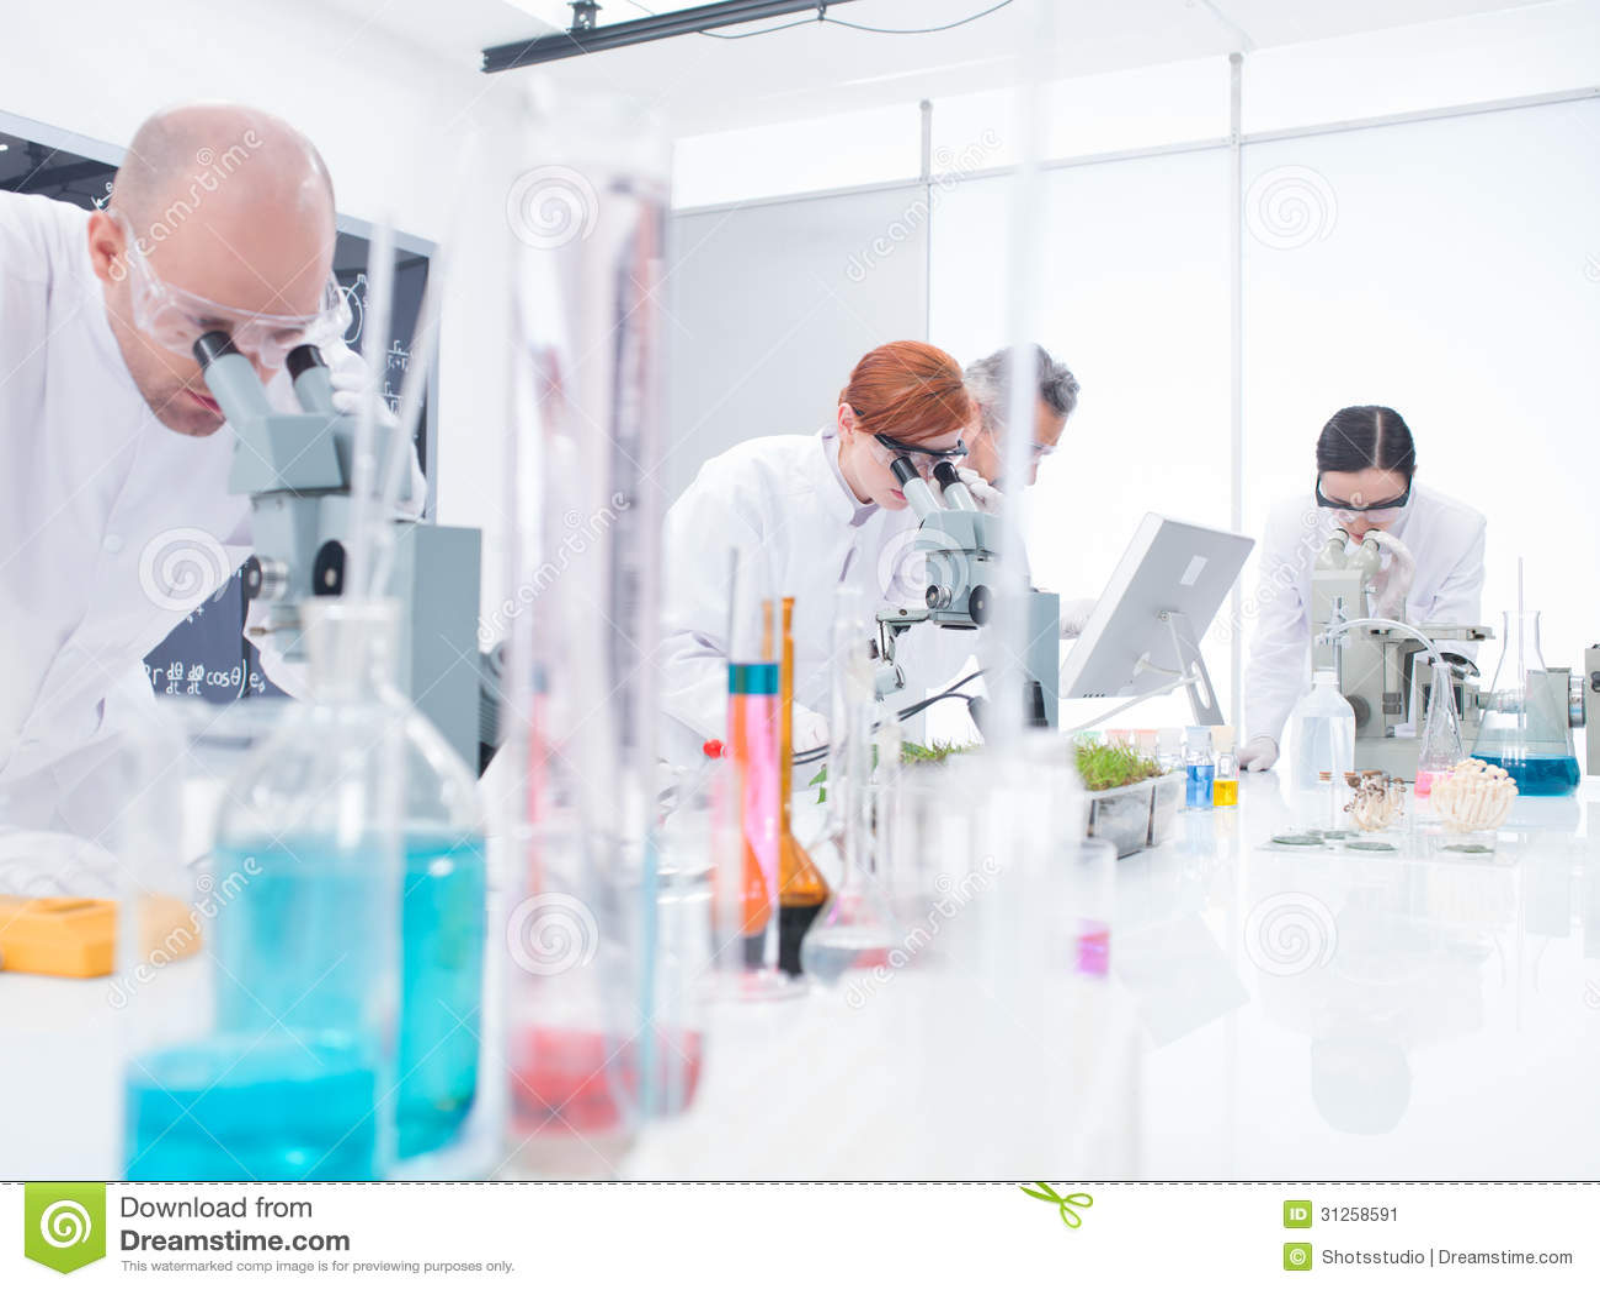 chemistry people paul pringle